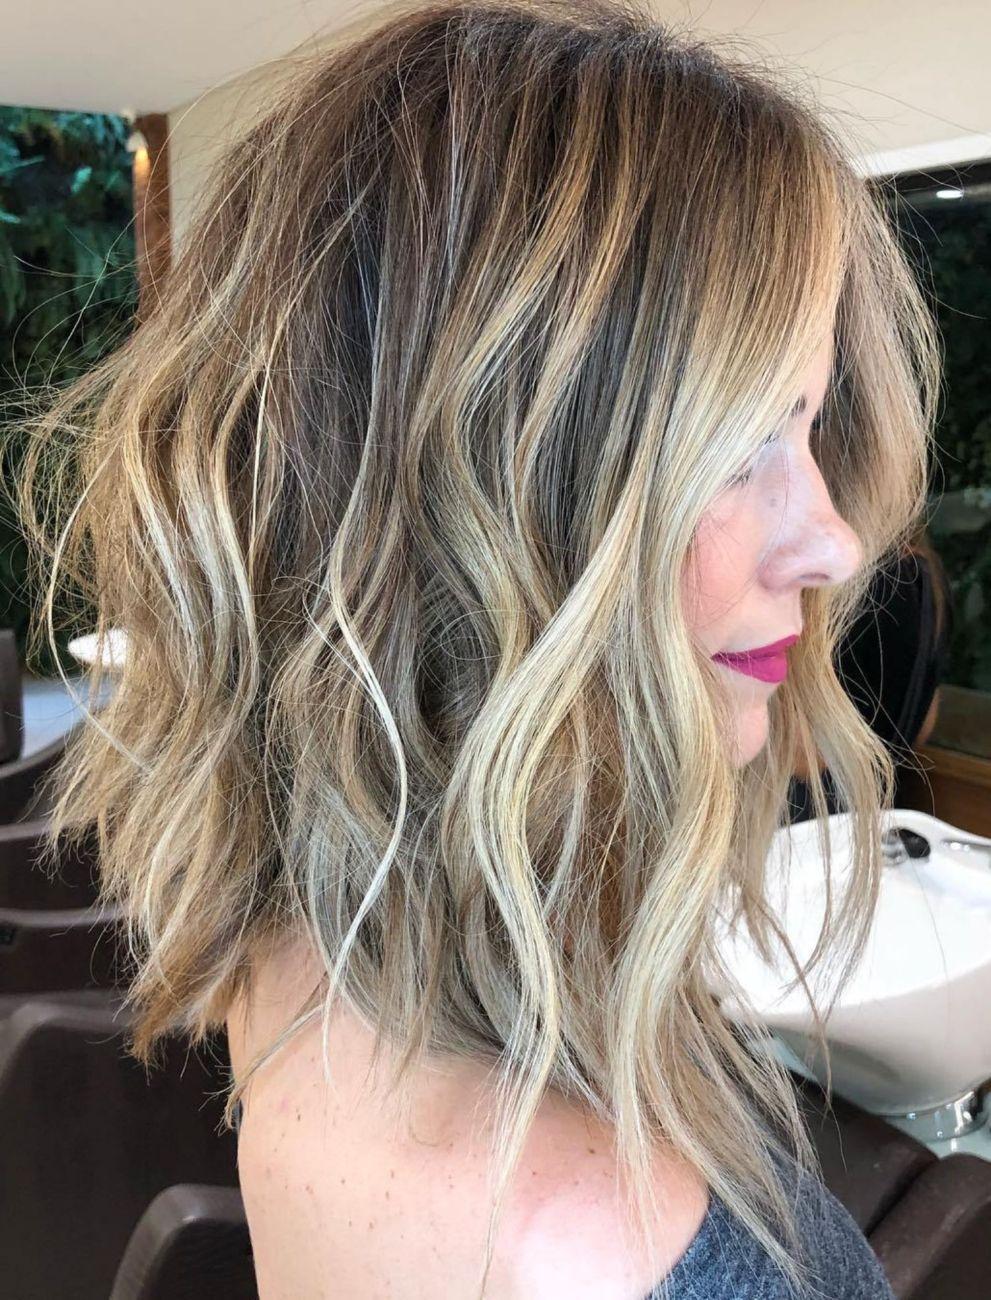 19+ Astonishing Hairstyles For Medium Length Hair Ideas ...